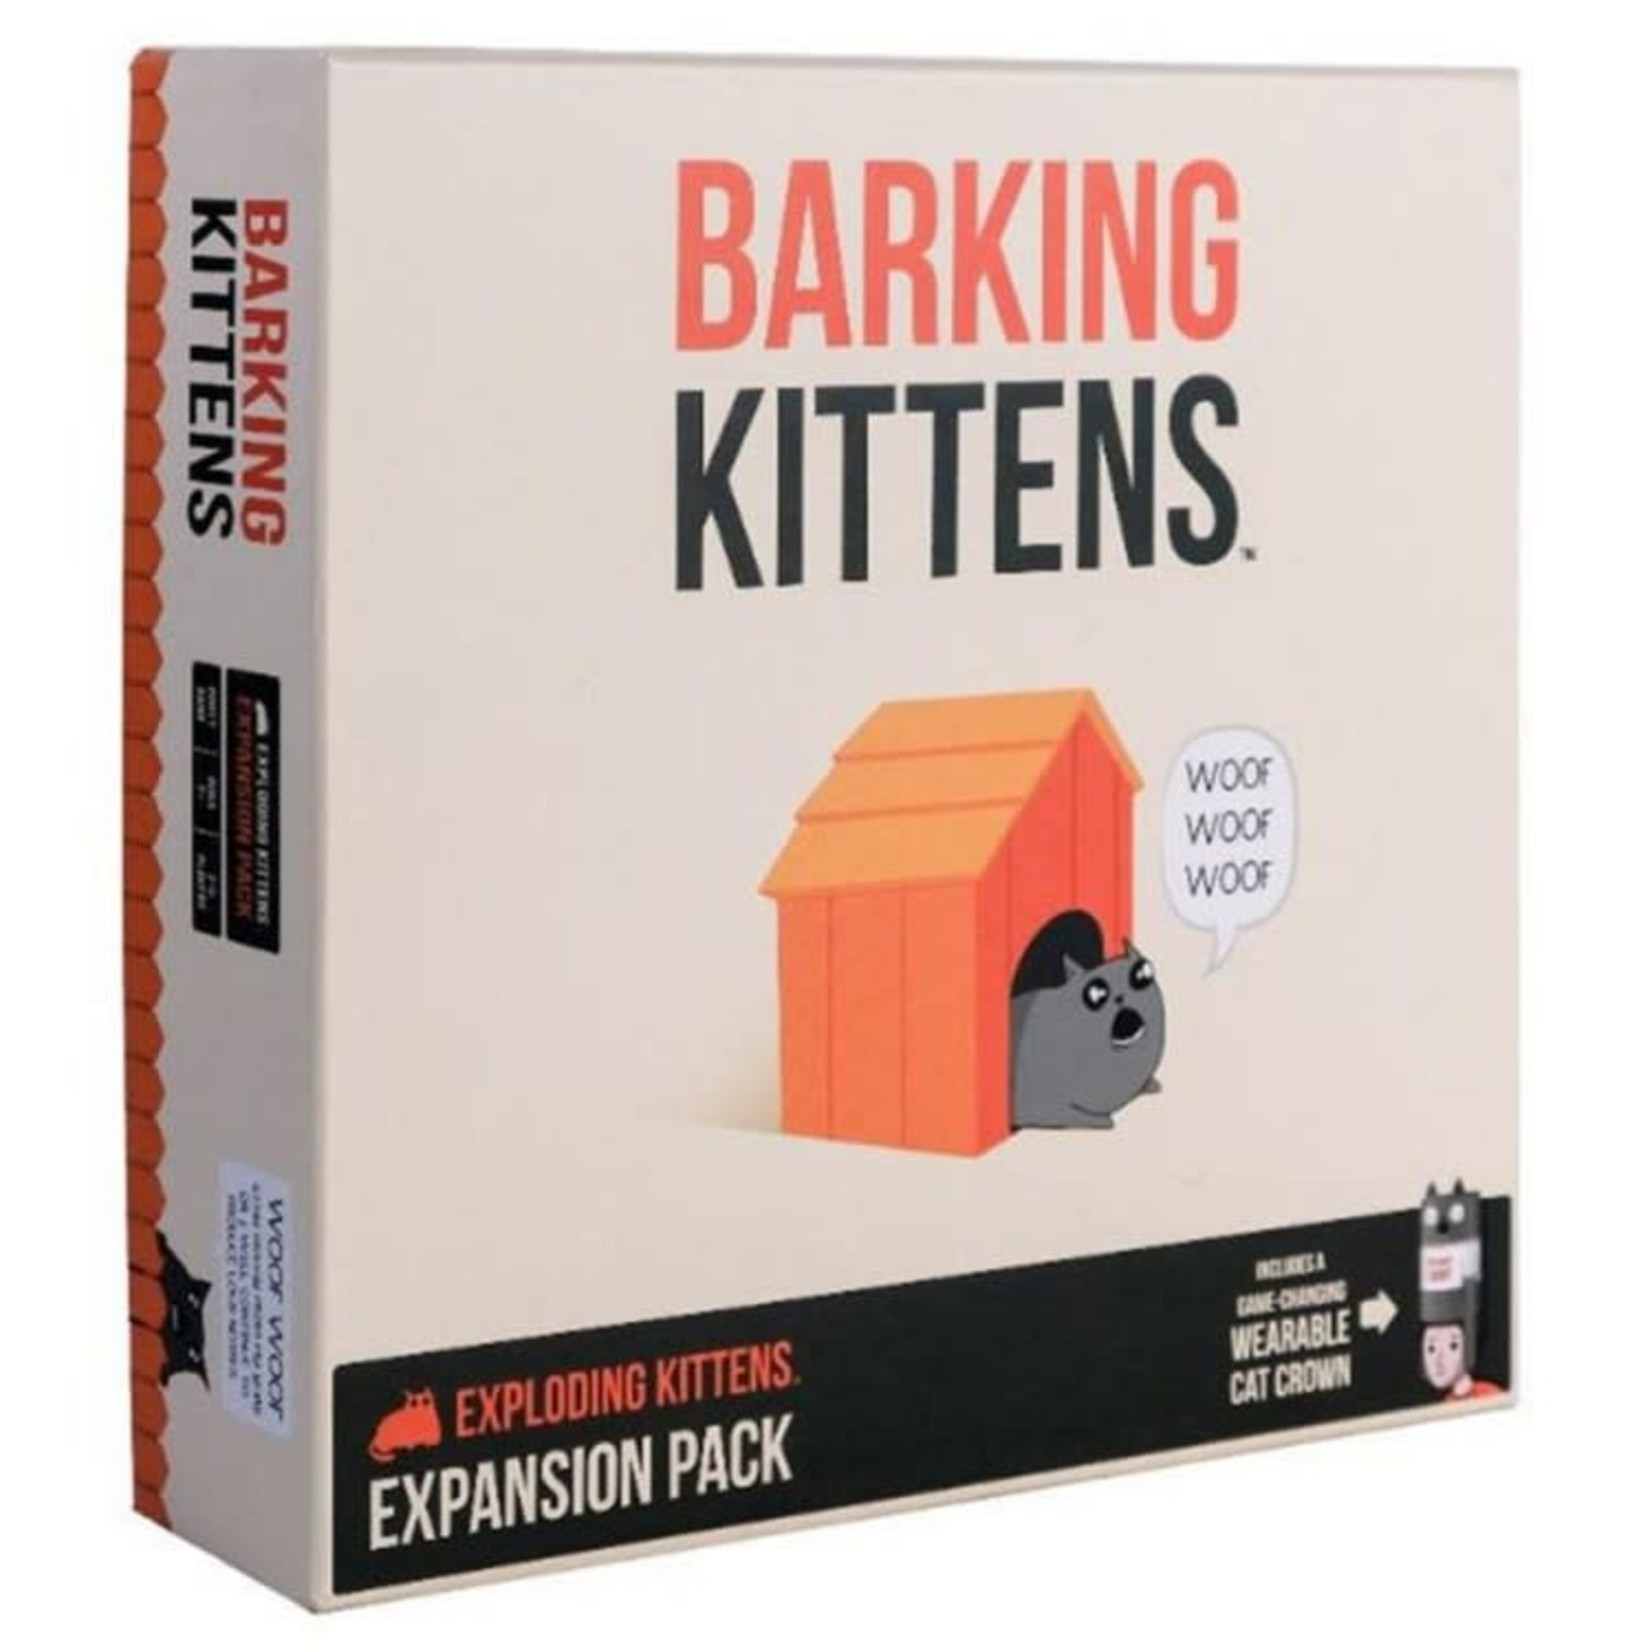 Exploding Kittens Exploding Kittens: Barking Kittens